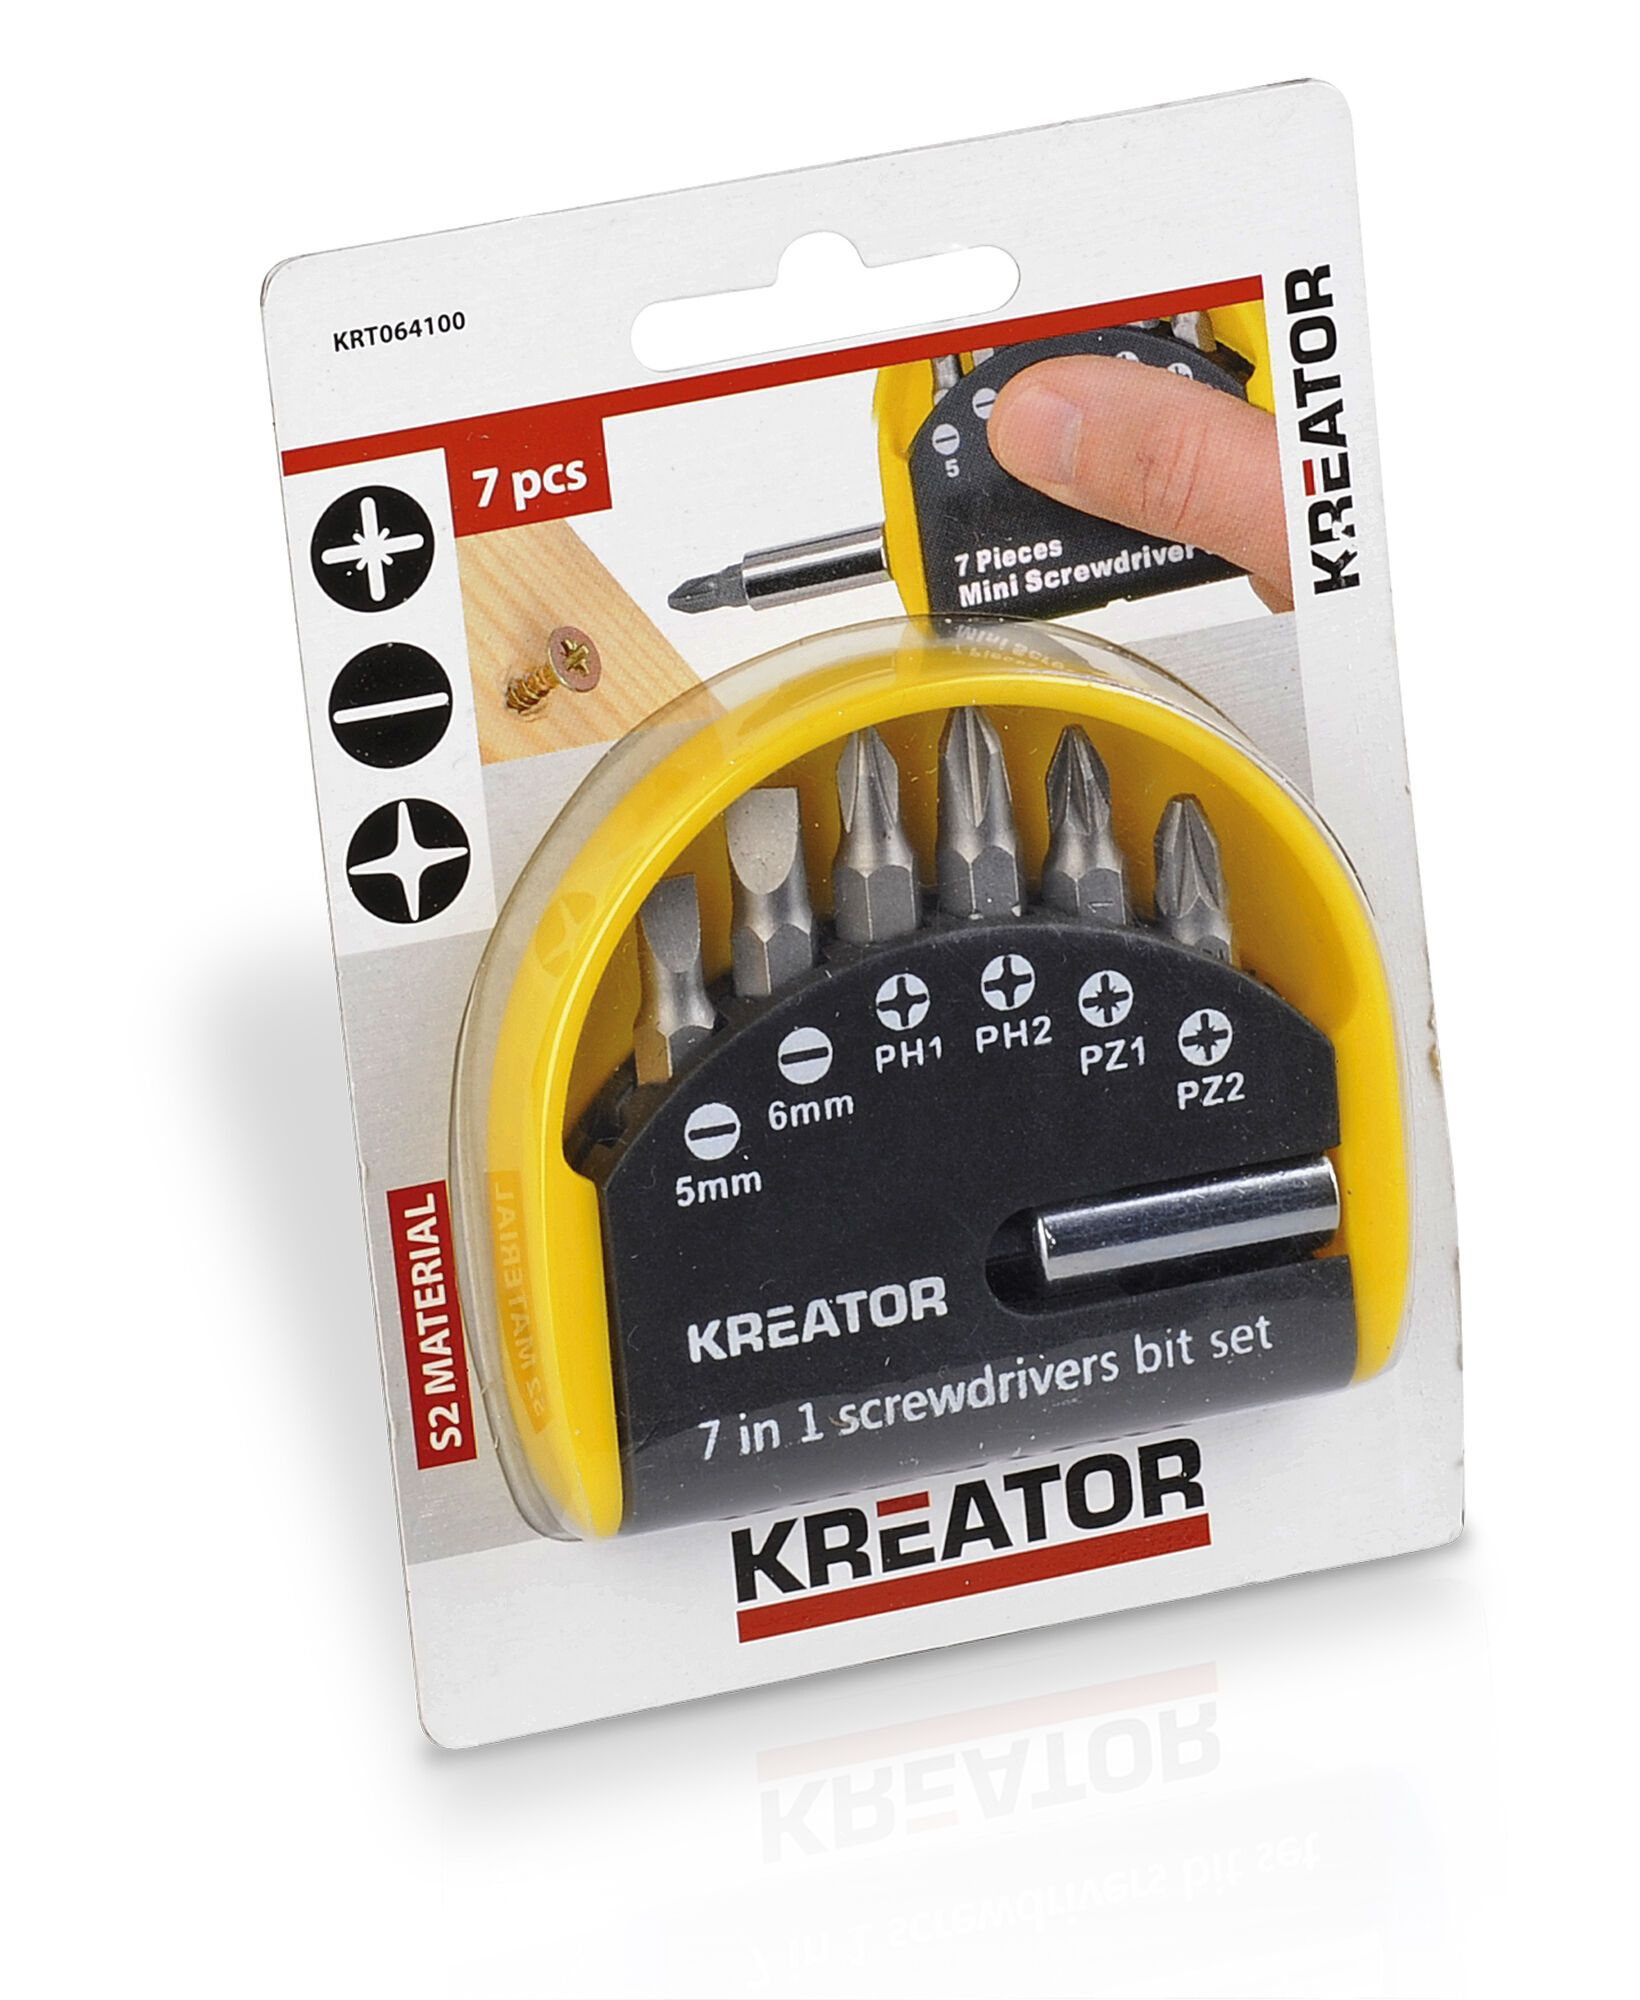 Kreator KRT064100 Bitset | 7-delige set bitjes